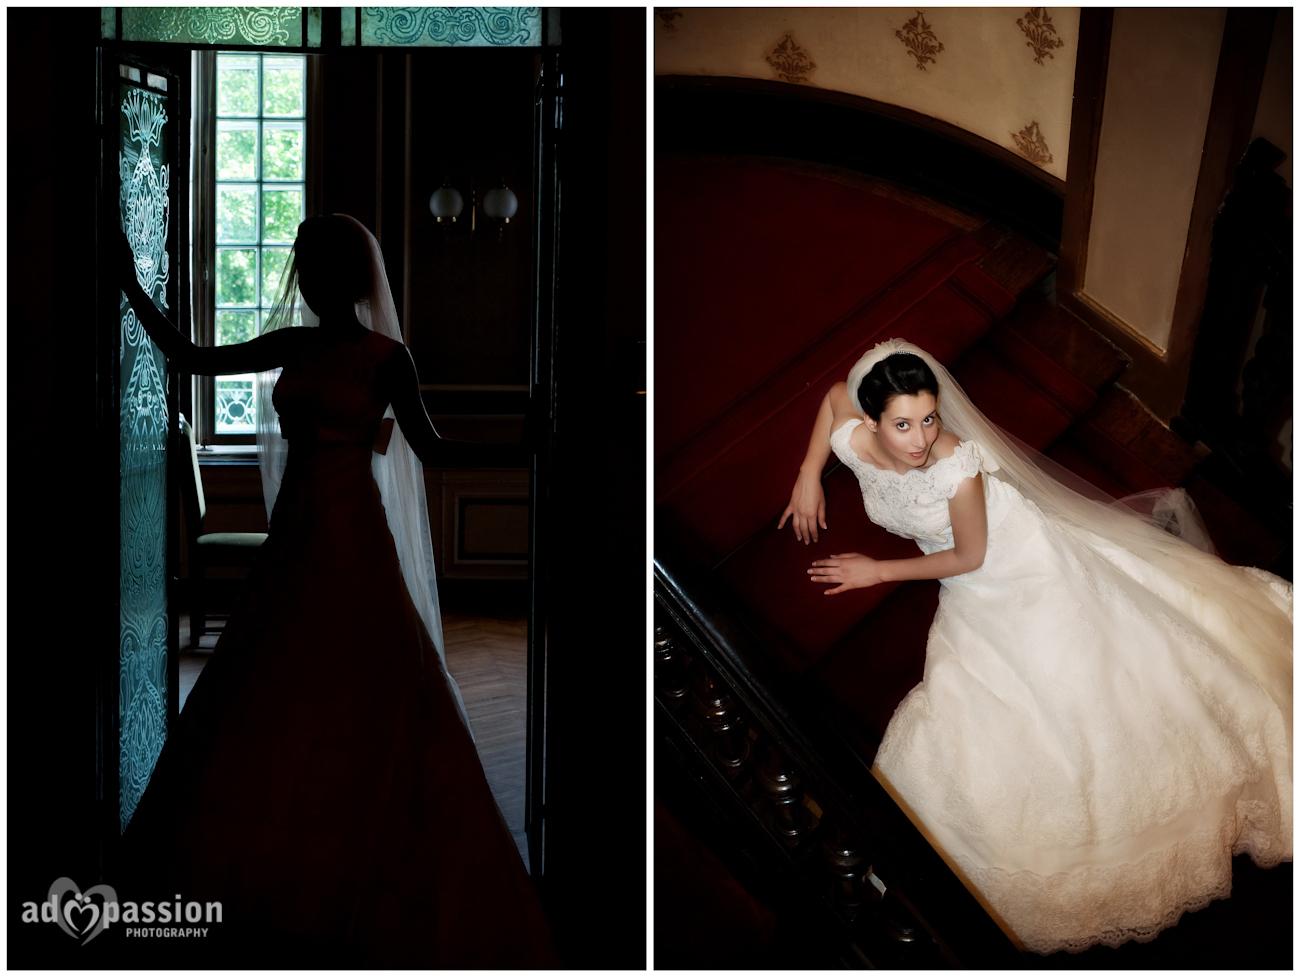 AD Passion Photography | 2011-05-22-Miriam&Florin_21 | Adelin, Dida, fotograf profesionist, fotograf de nunta, fotografie de nunta, fotograf Timisoara, fotograf Craiova, fotograf Bucuresti, fotograf Arad, nunta Timisoara, nunta Arad, nunta Bucuresti, nunta Craiova